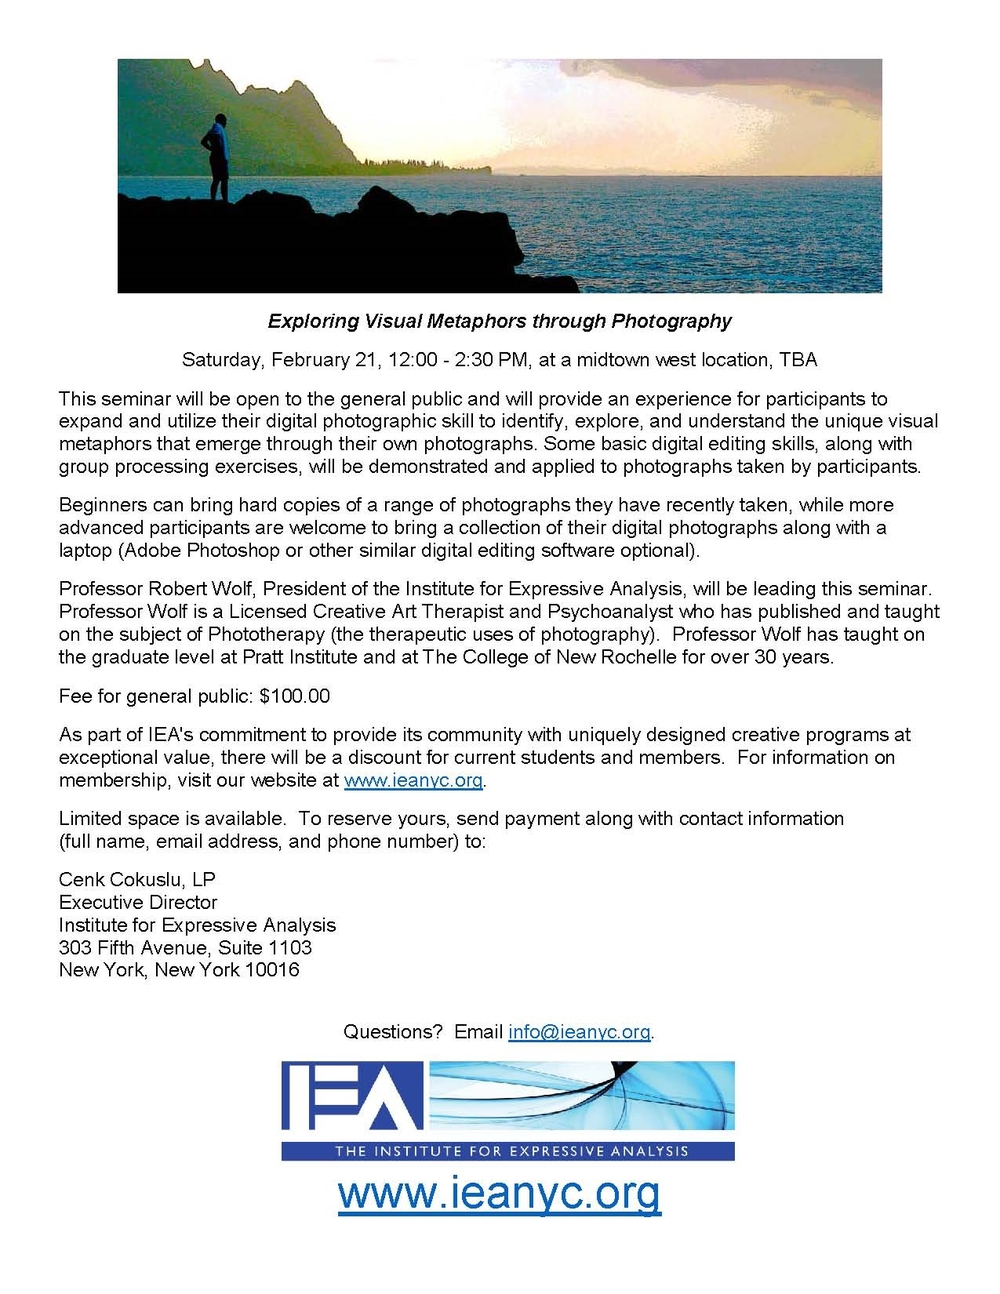 ExploringVisualMetaphorsthroughPhotography-BobWolf.jpg